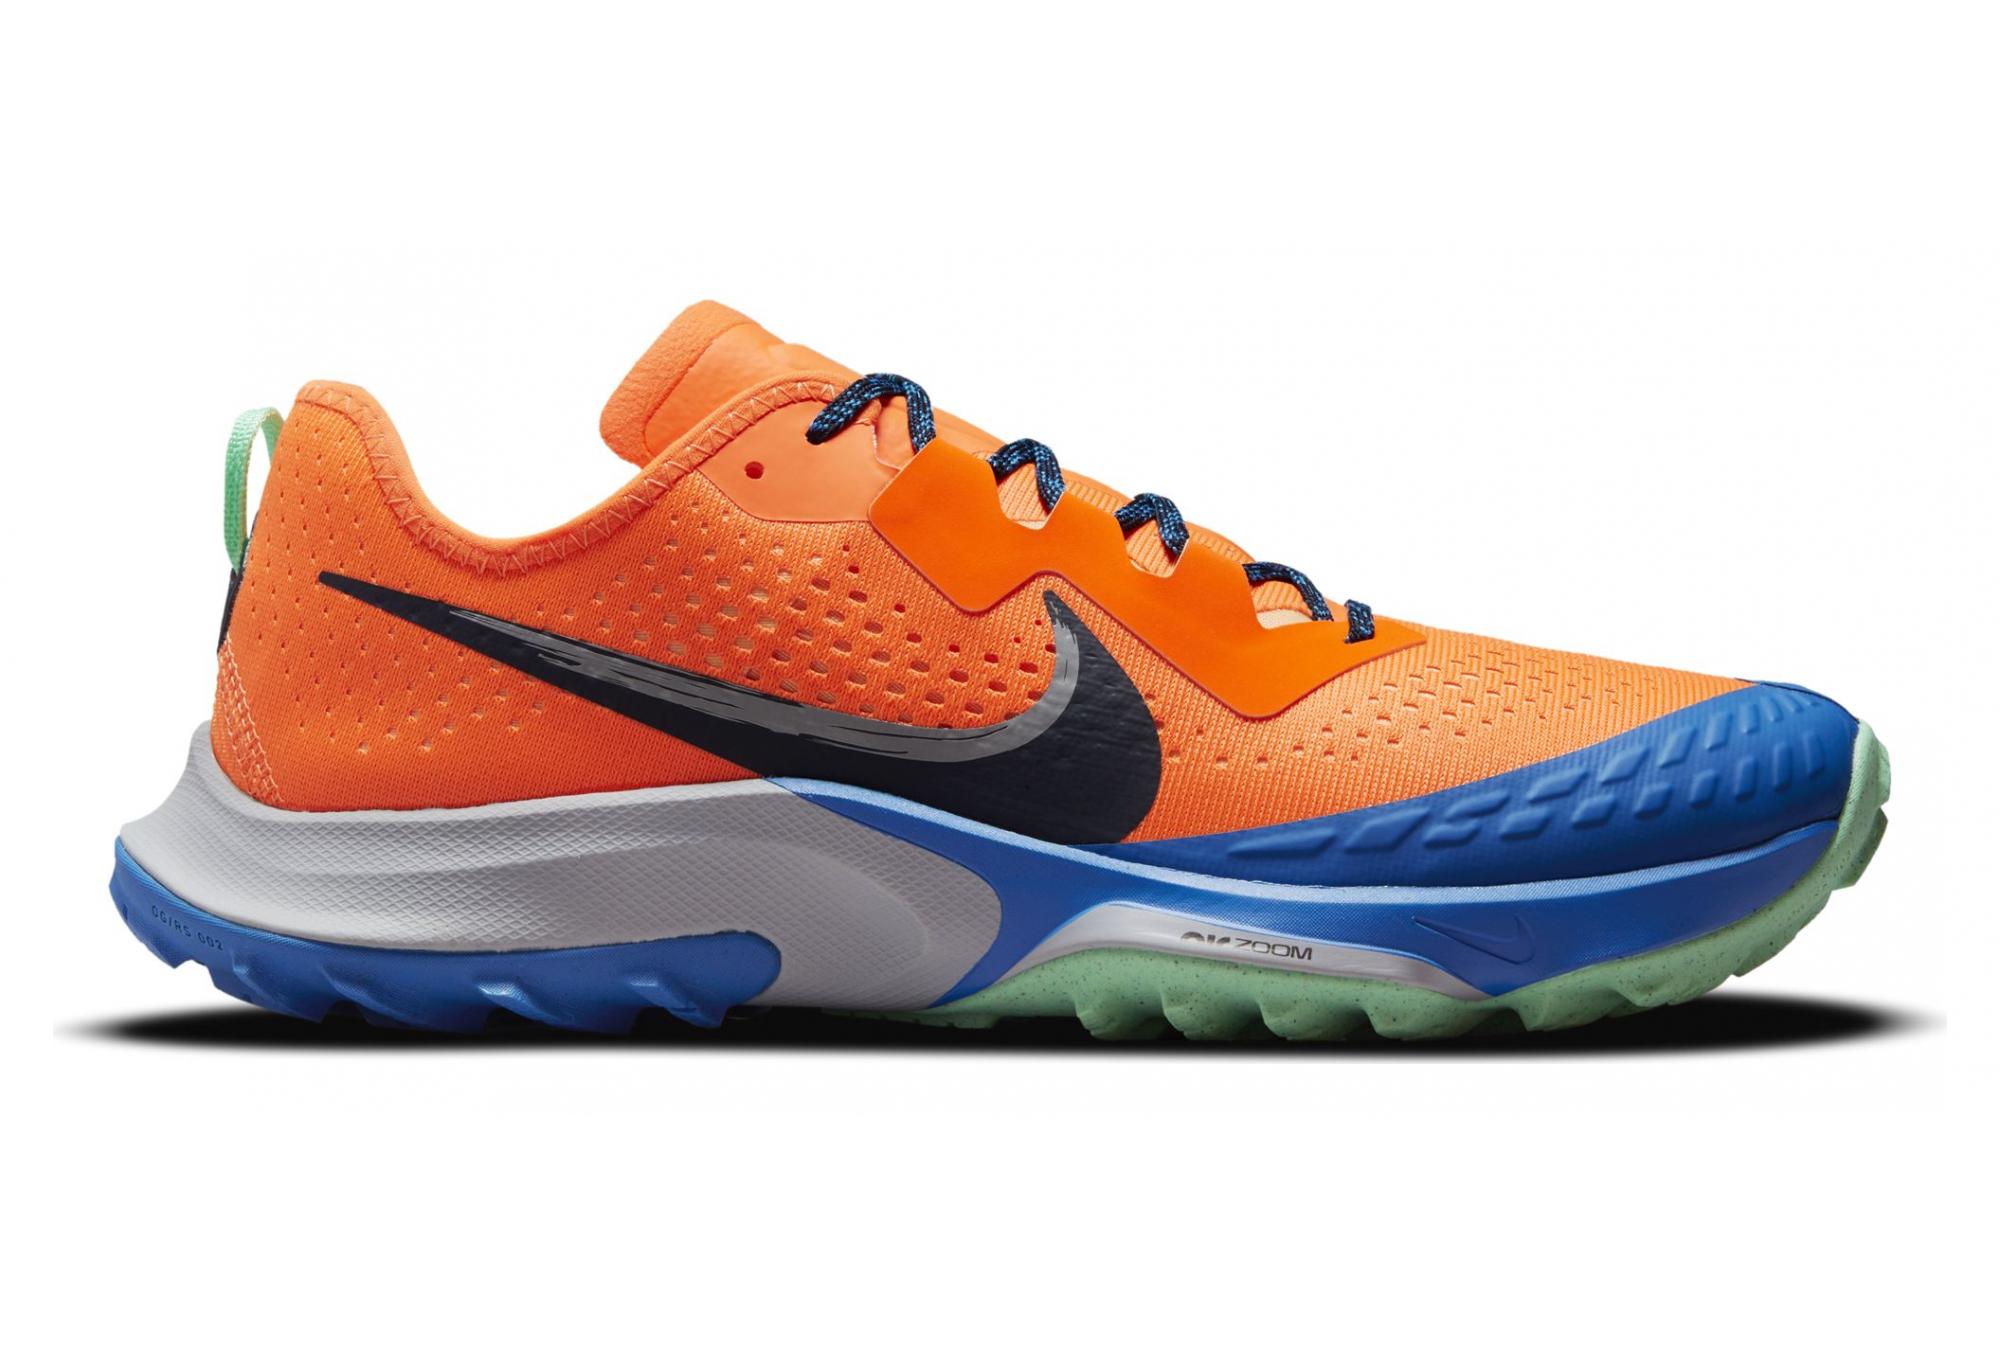 Nike Air Zoom Terra Kiger 7 Trail Running Shoes Orange/Blue